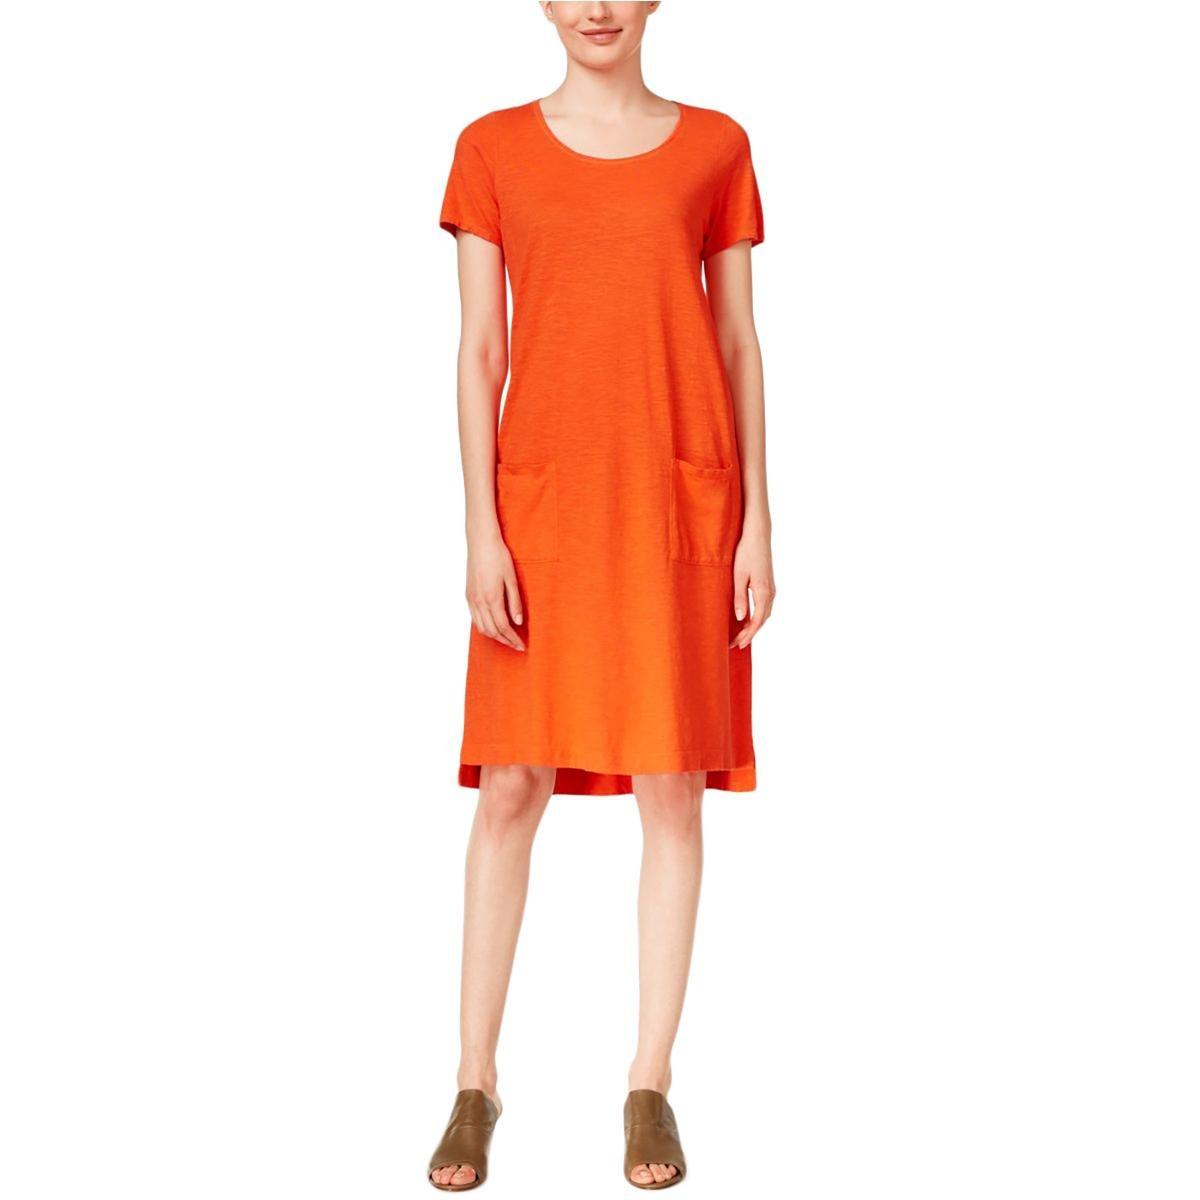 ffddab29e49 Eileen Fisher Womens Scoop Neck Casual T-Shirt Dress Orange XS at Amazon  Women s Clothing store